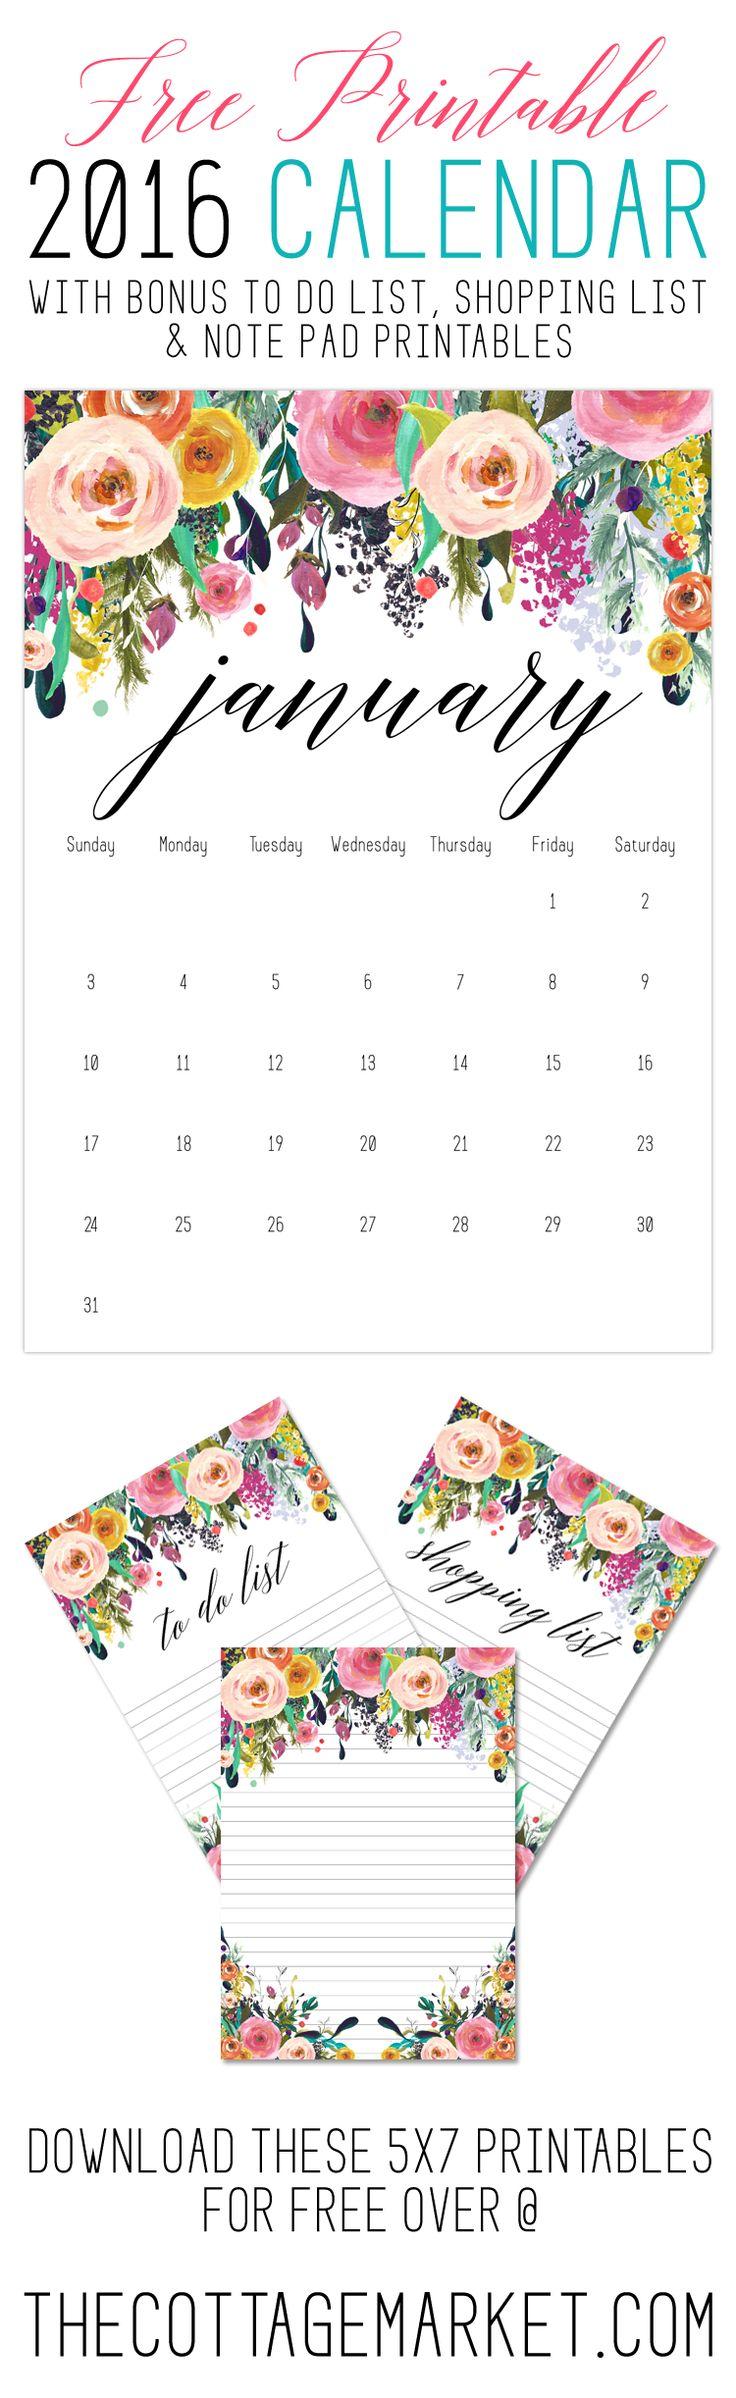 A Dozen 2016 Free Printable Calendars - The Cottage Market